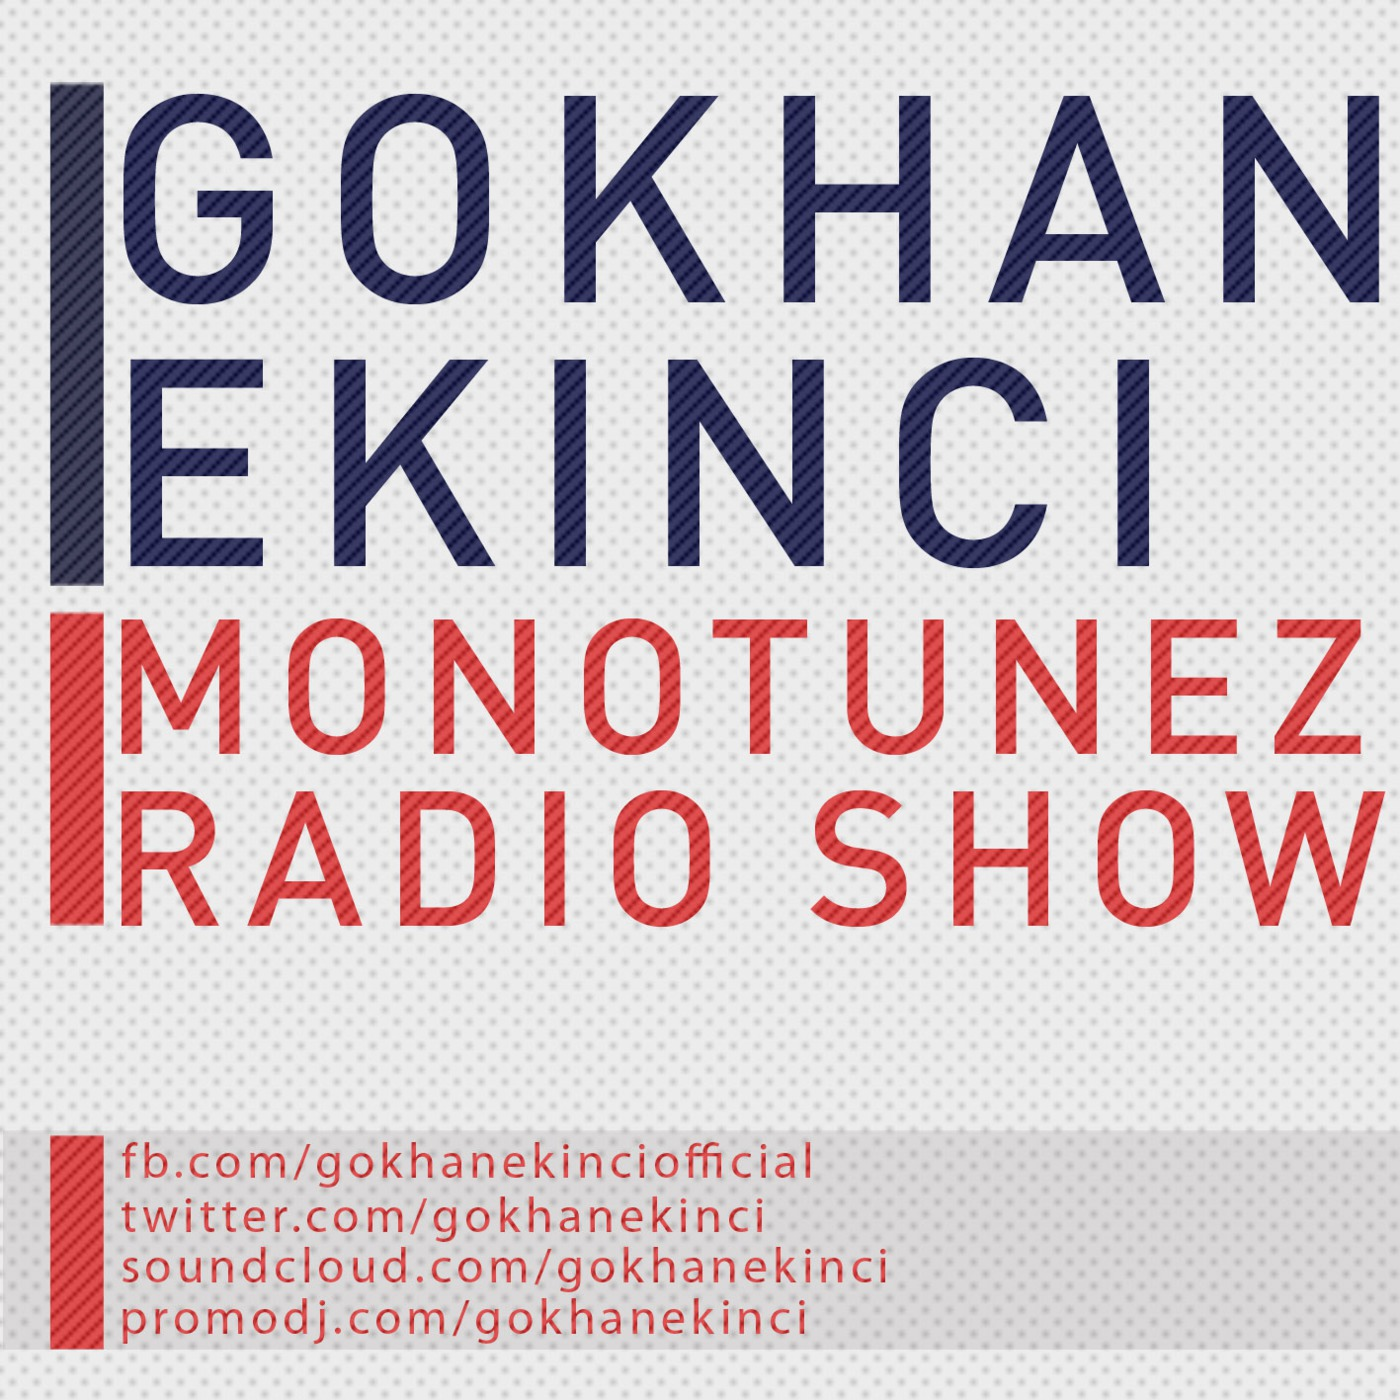 Gokhan Ekinci's Podcast